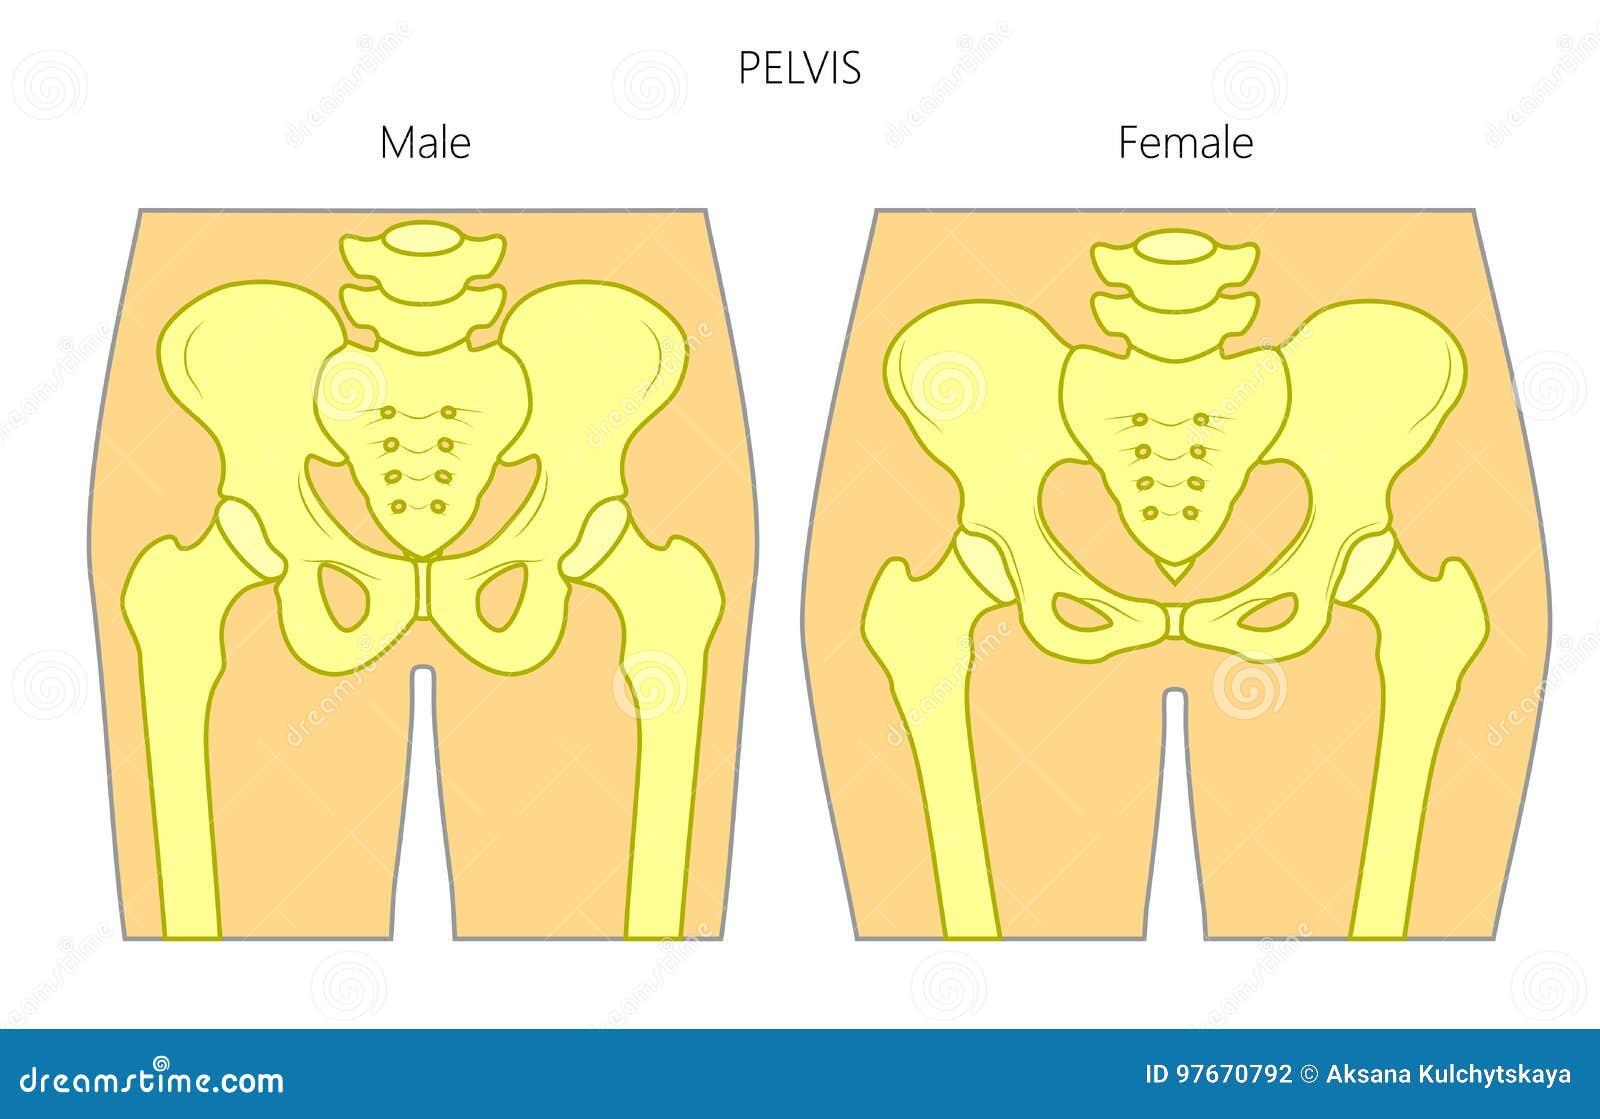 problemas en la pelvis femenina